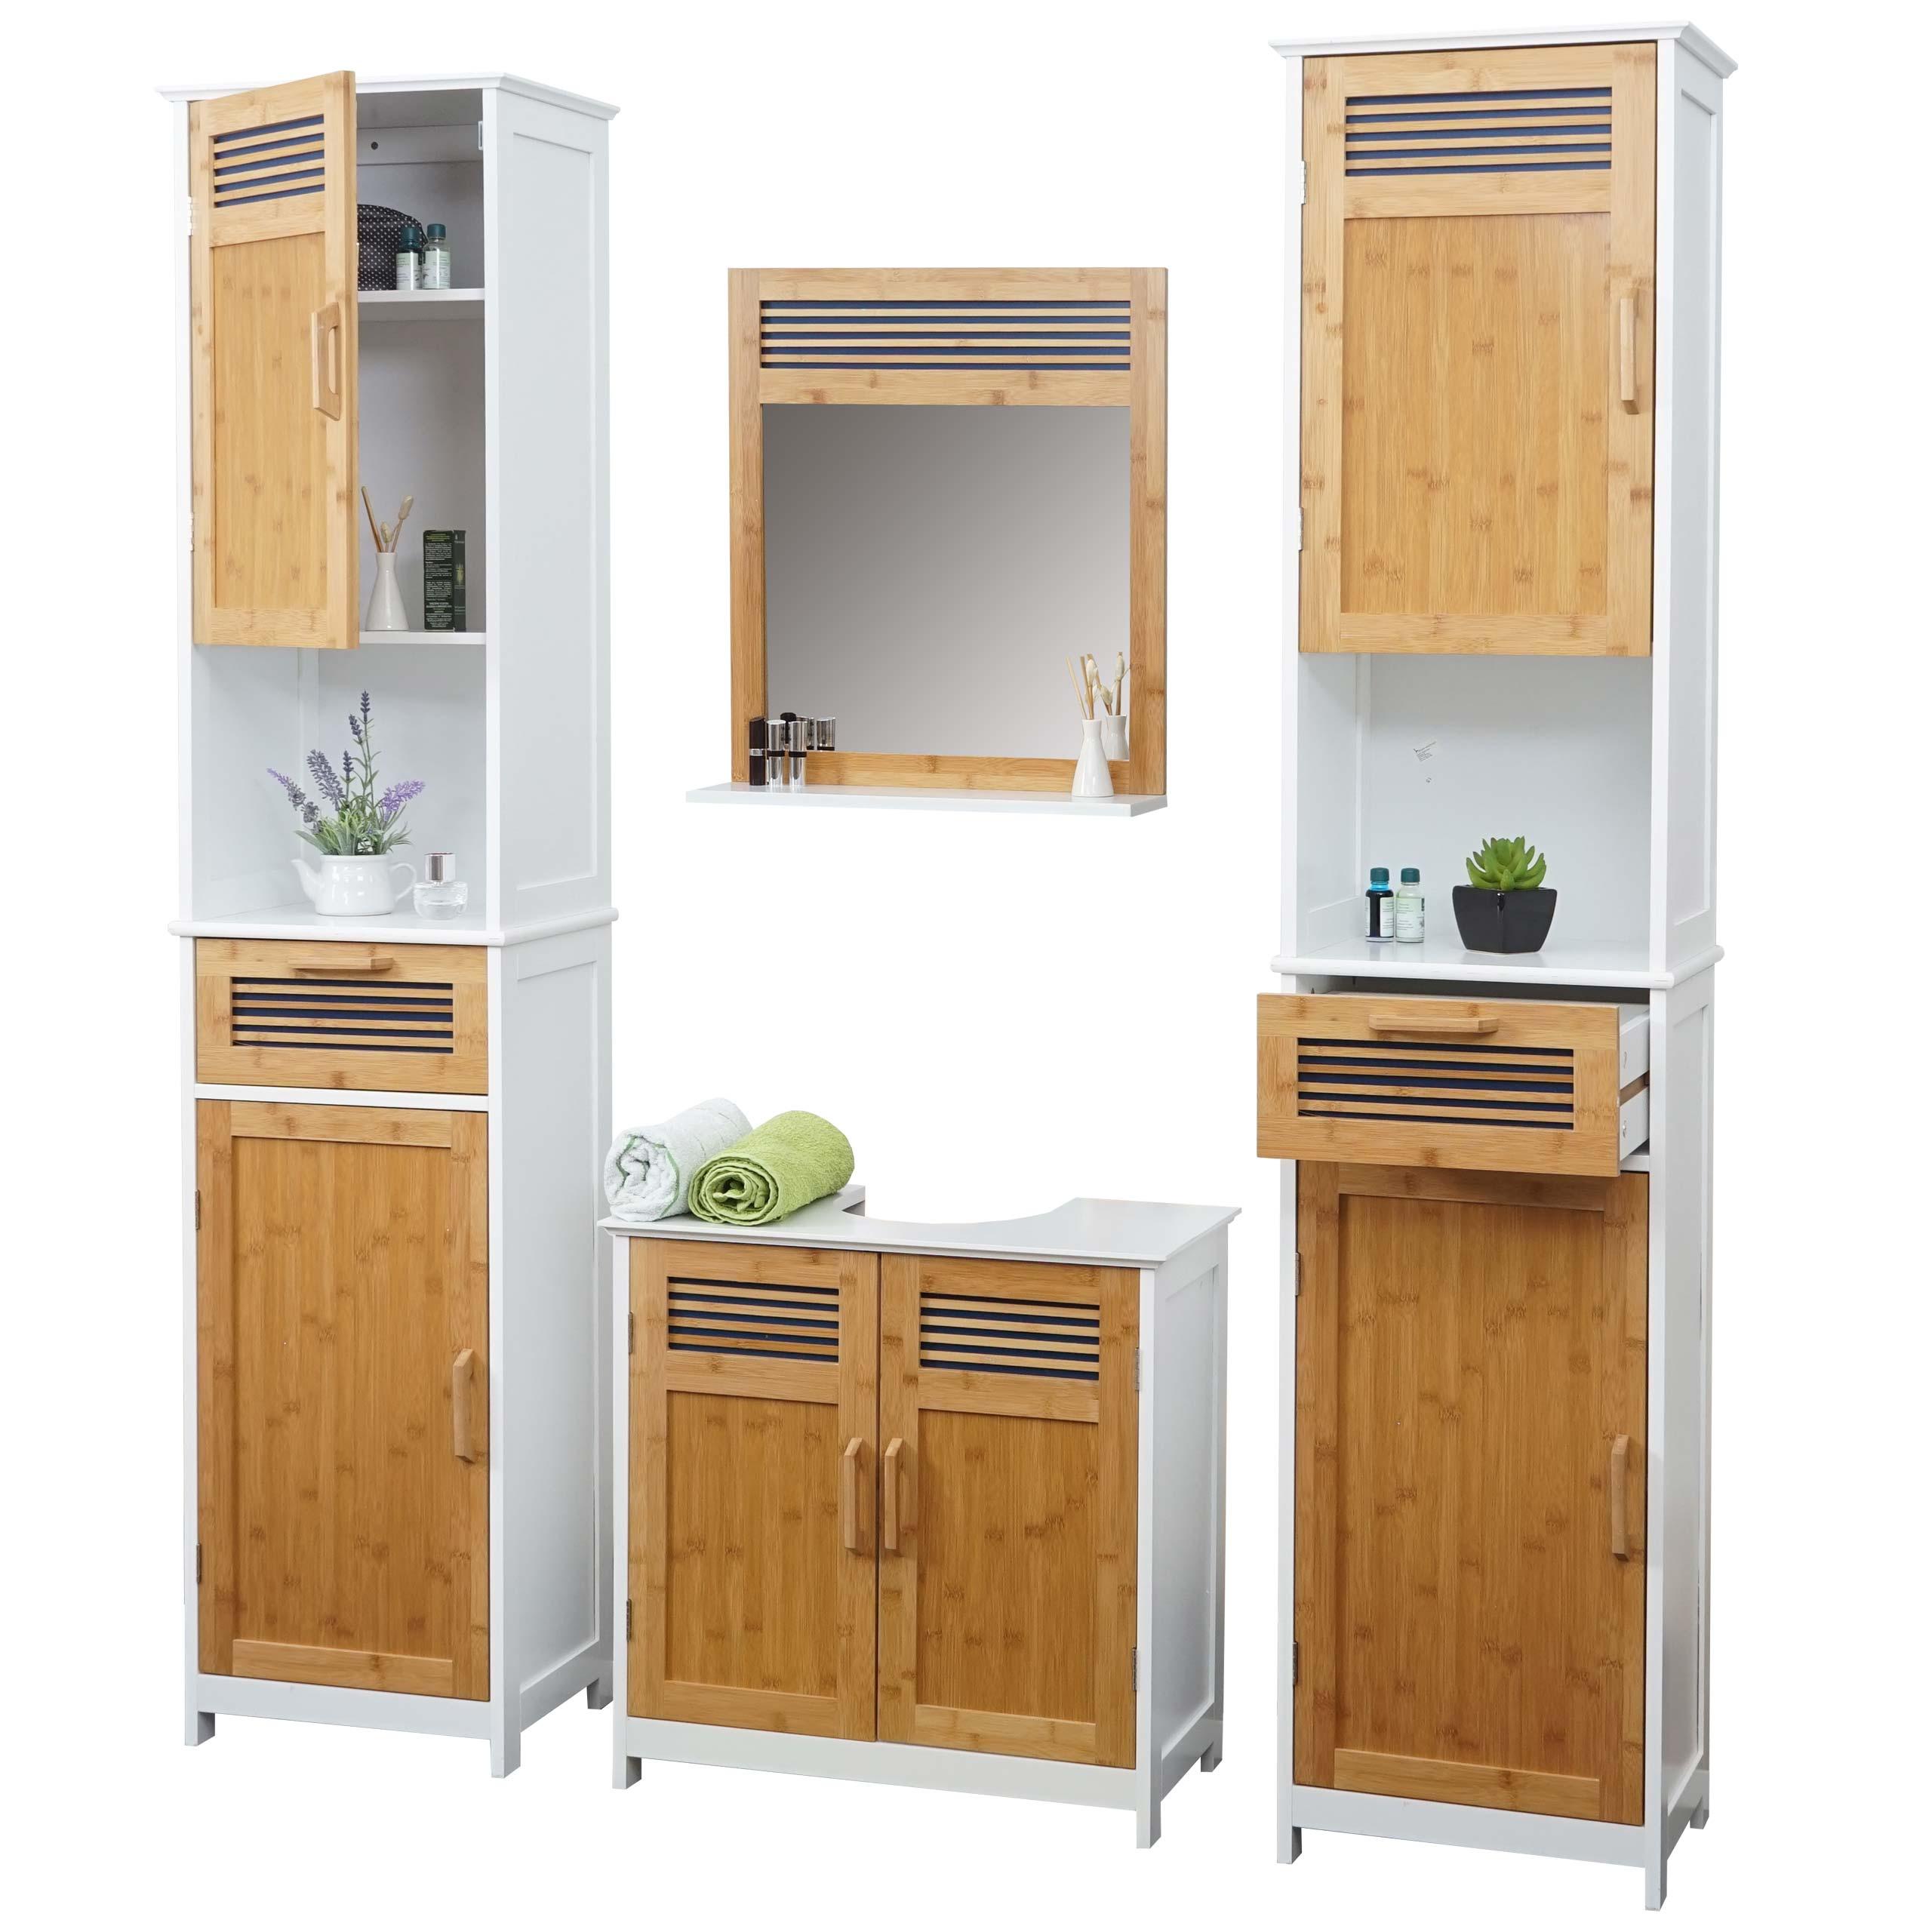 midischrank bad wei perfect brillant ideen badezimmer. Black Bedroom Furniture Sets. Home Design Ideas